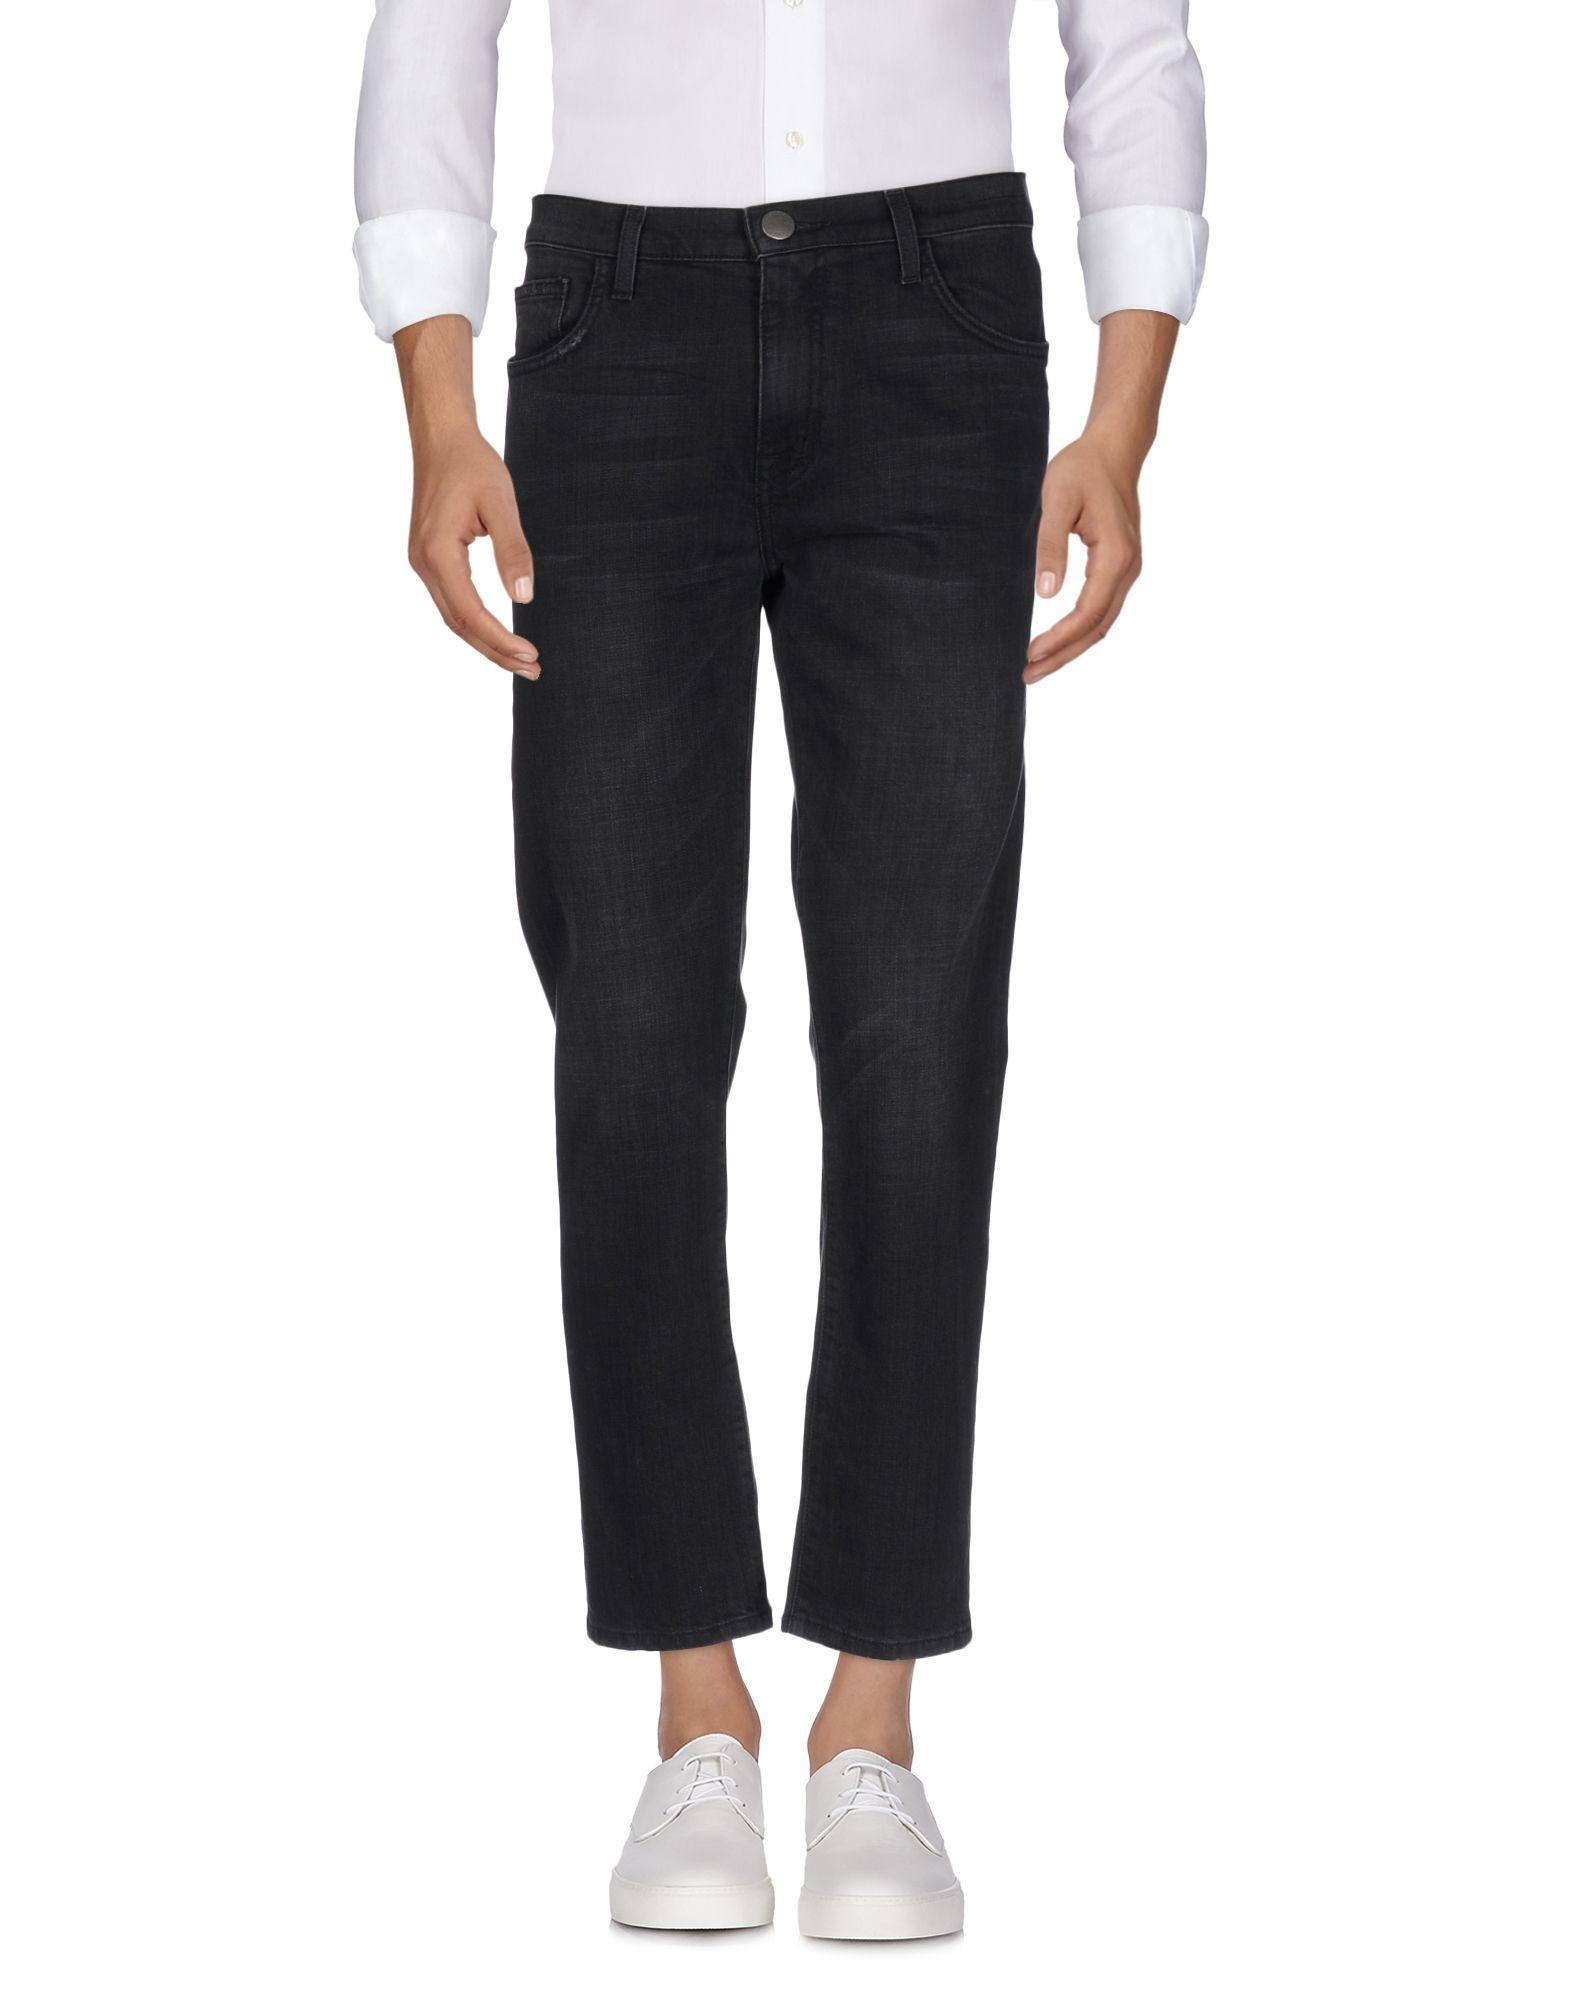 Pantaloni Jeans Current/Elliott Donna - Acquista online su